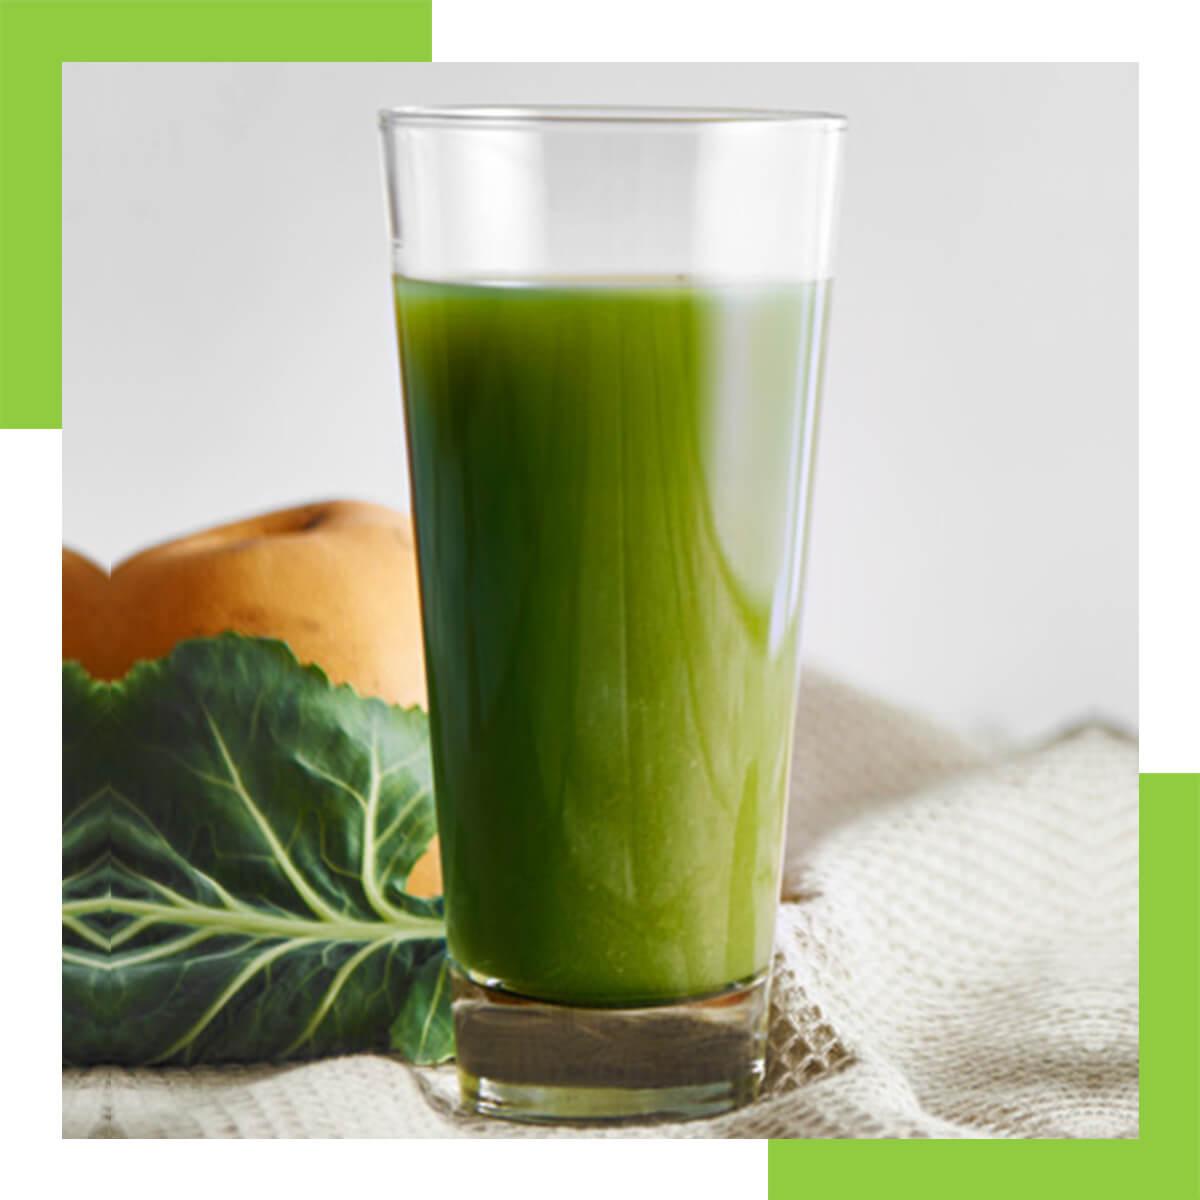 GreenBio Juice